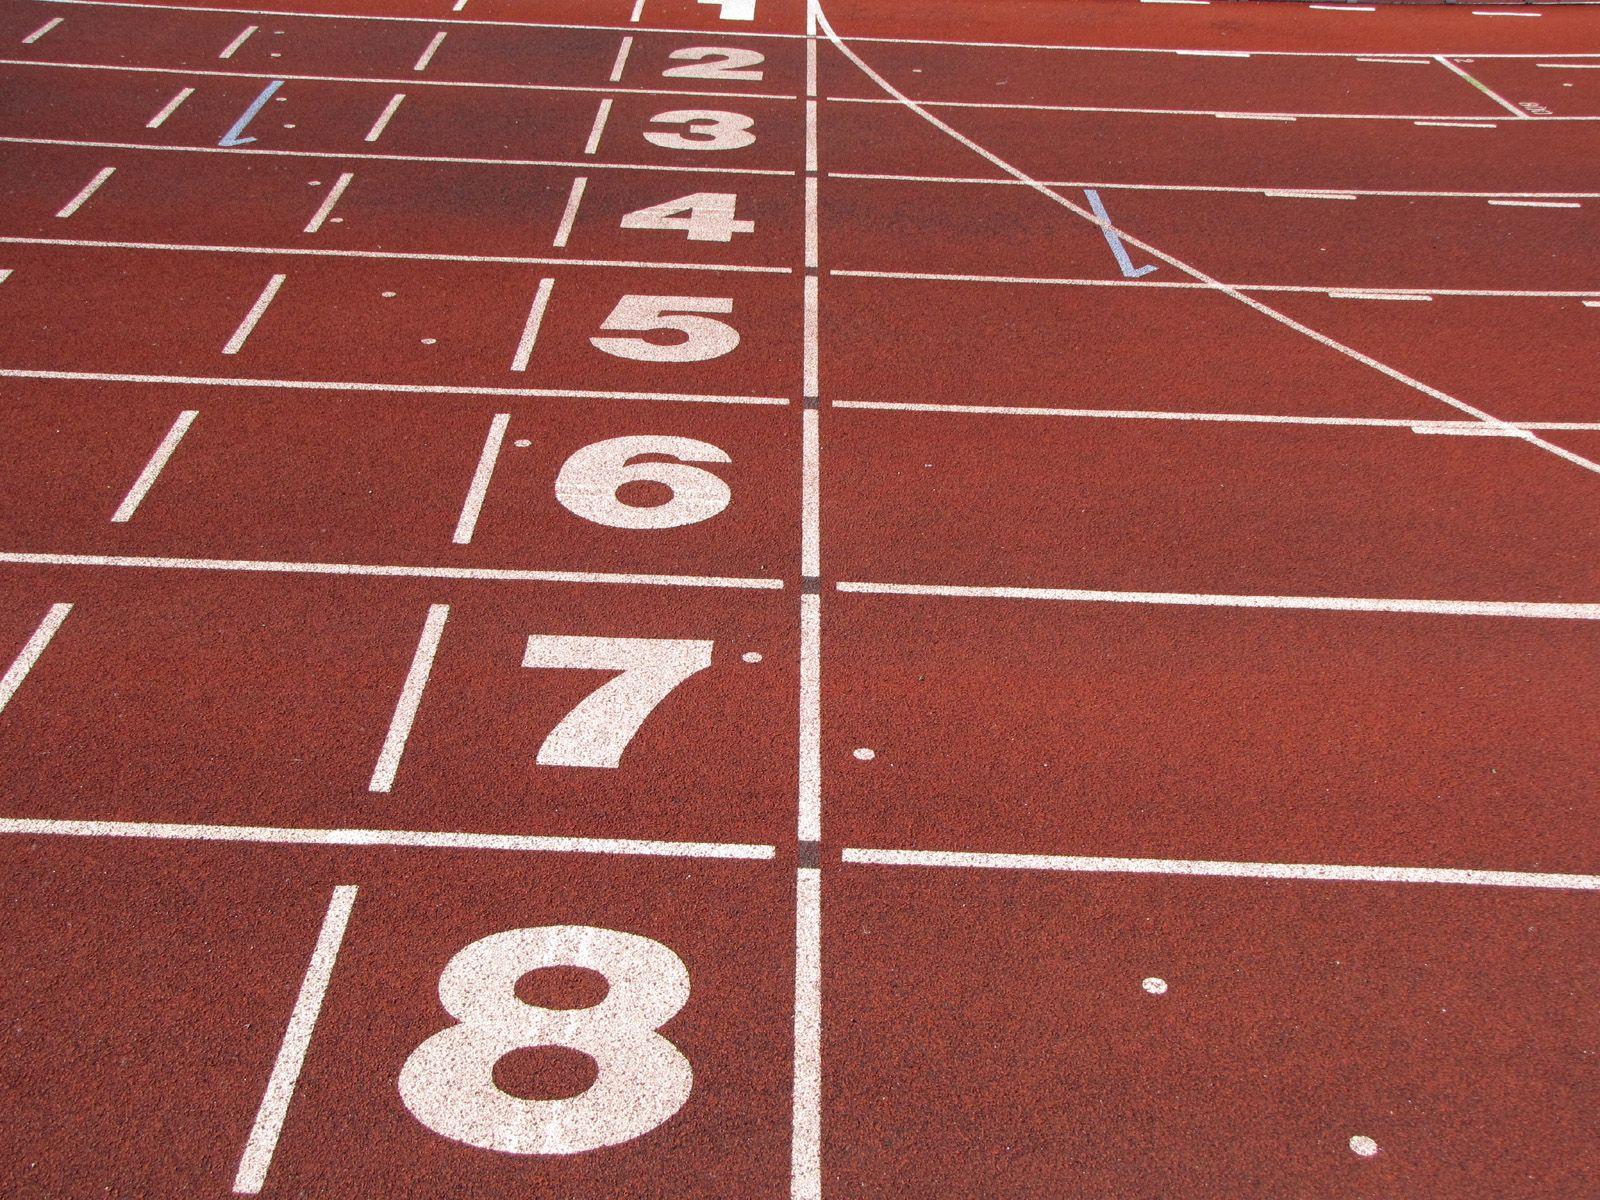 Kip Keino Classic athletics event in Kenya to go ahead - Sports Leo